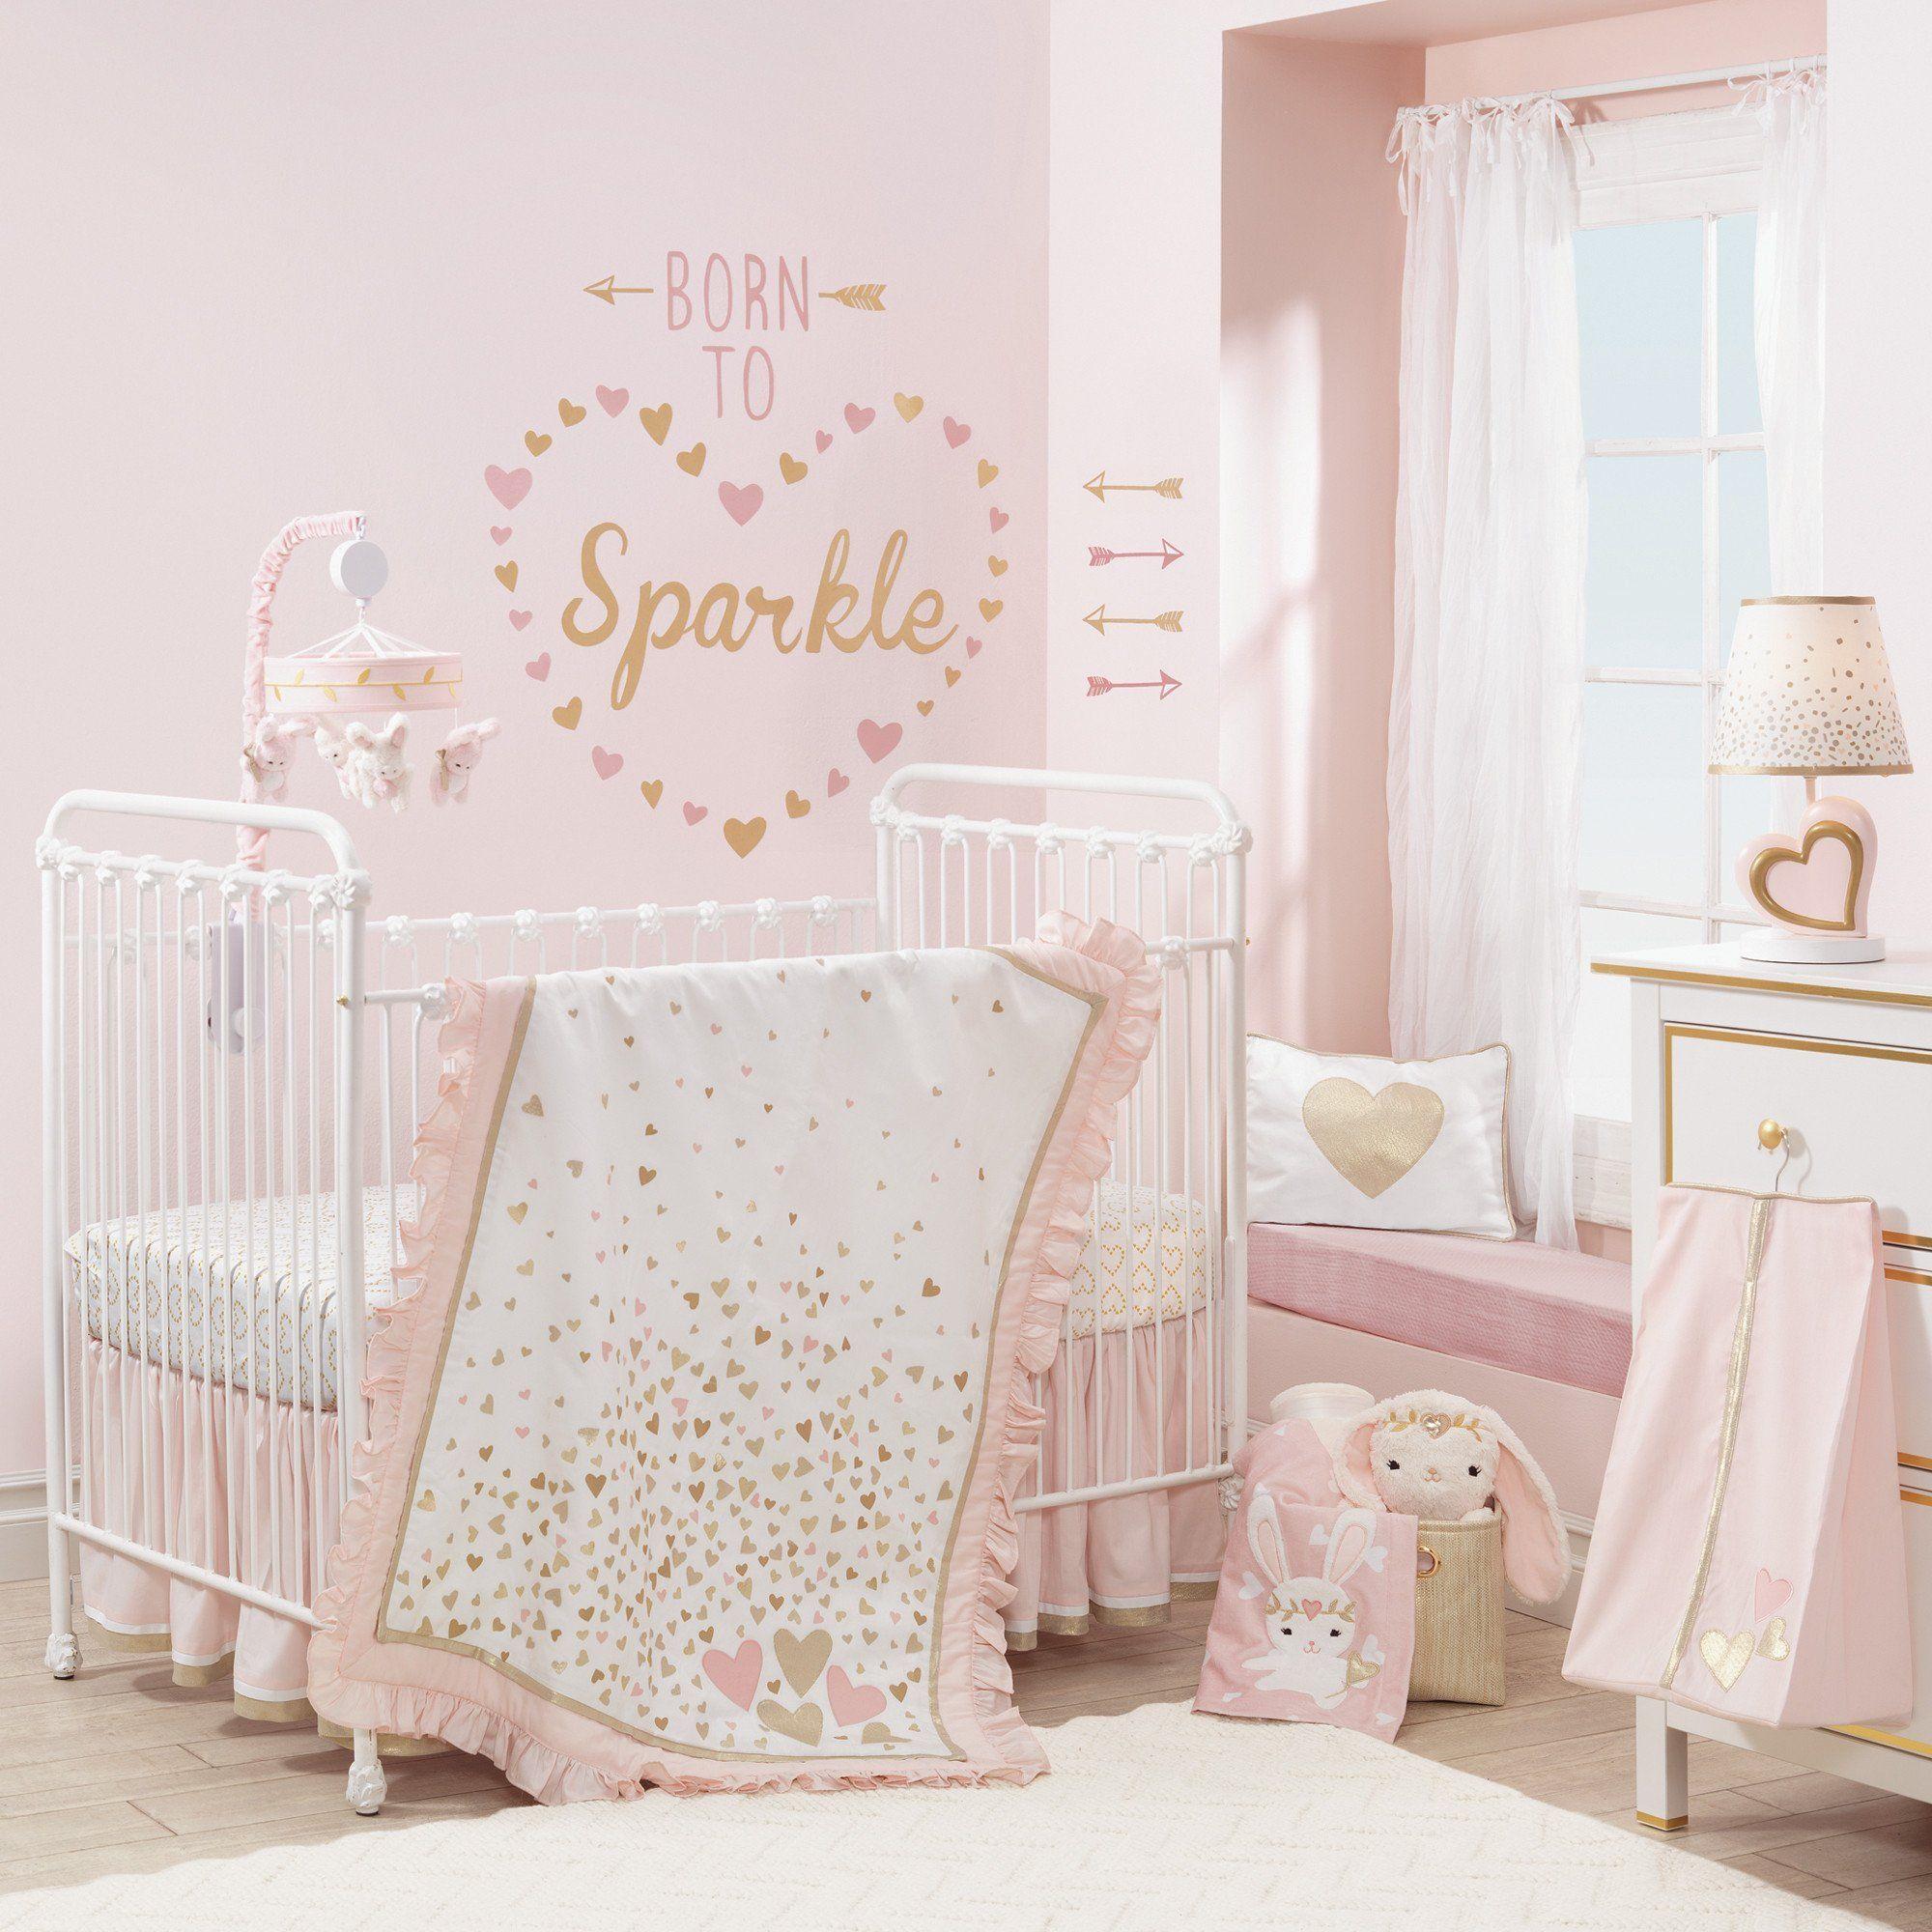 Confetti 4 Piece Crib Bedding Set Baby Crib Bedding Sets Crib Bedding Baby Bed